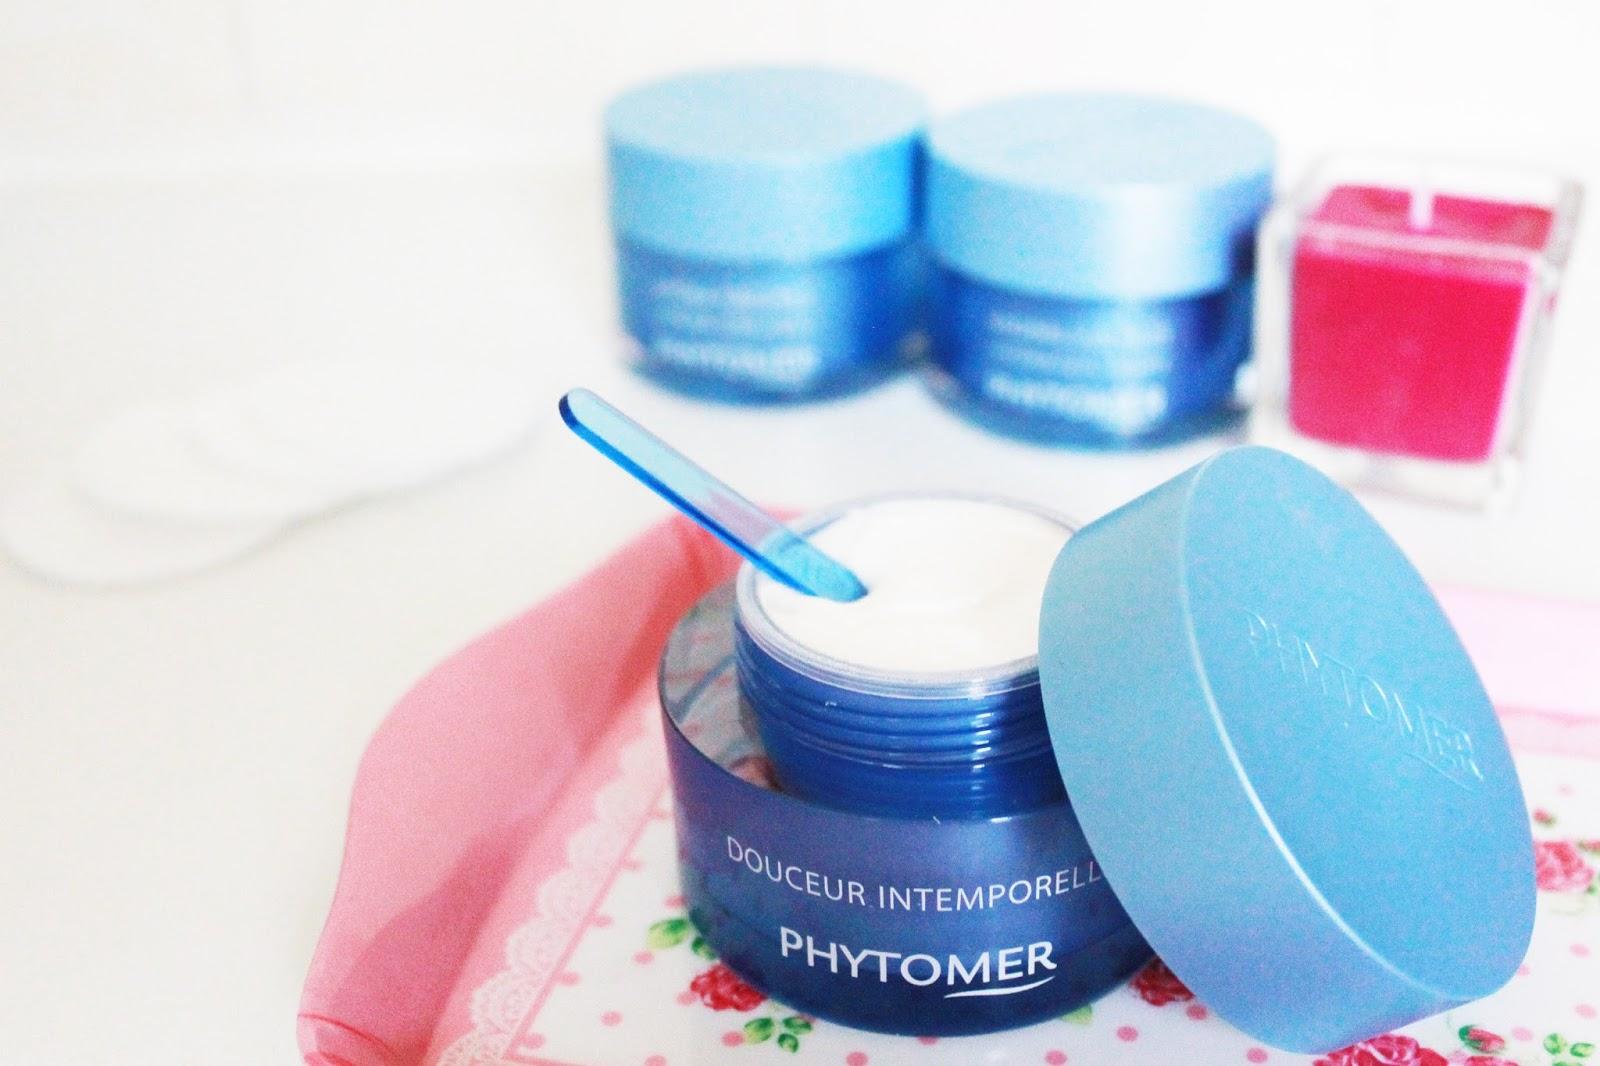 Phytomer crèmes hydratantes